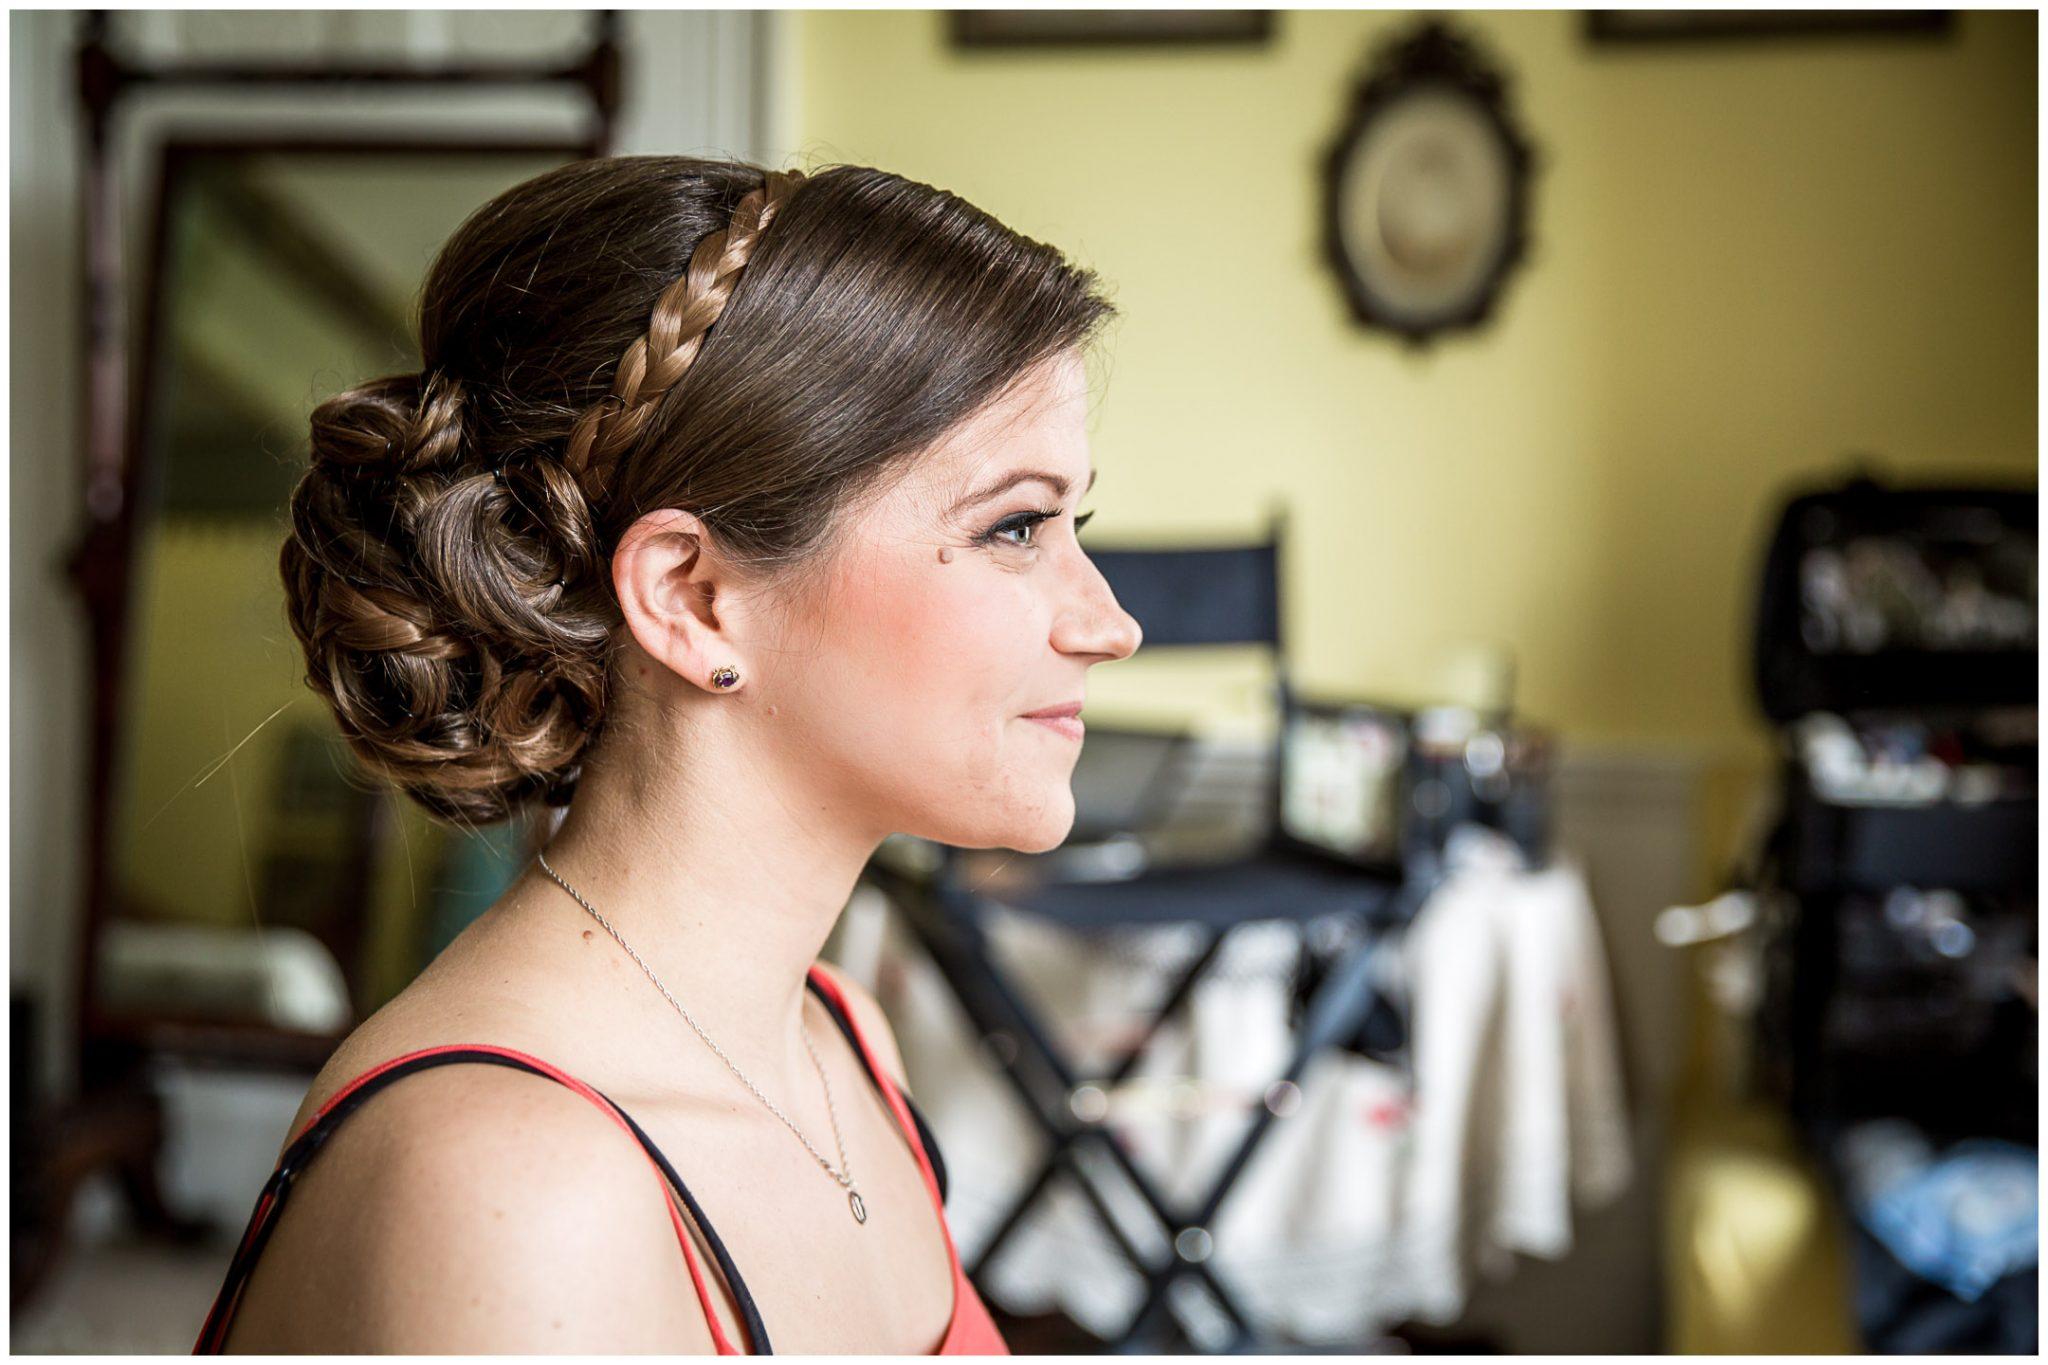 Avington Park wedding photography bridal preparation in dressing room